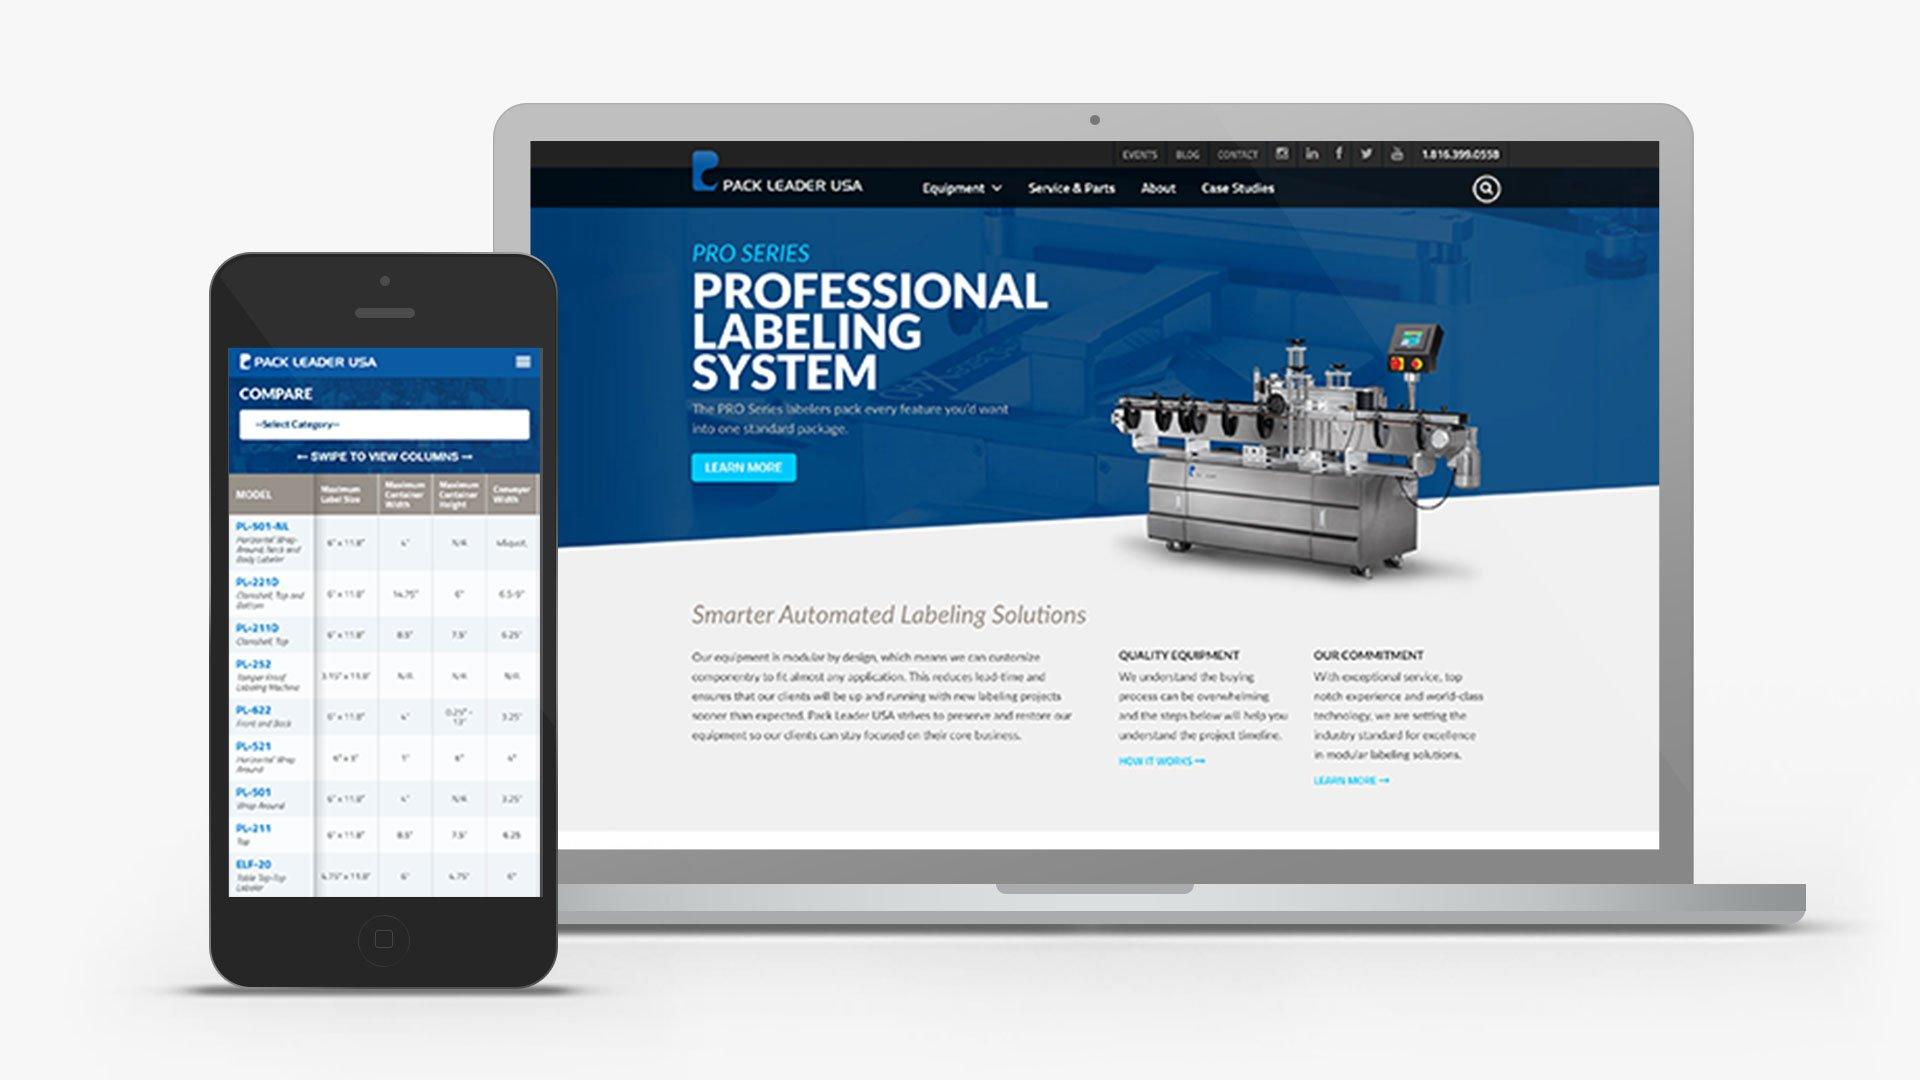 TANK_Manufacturing_Pack-Leader-USA